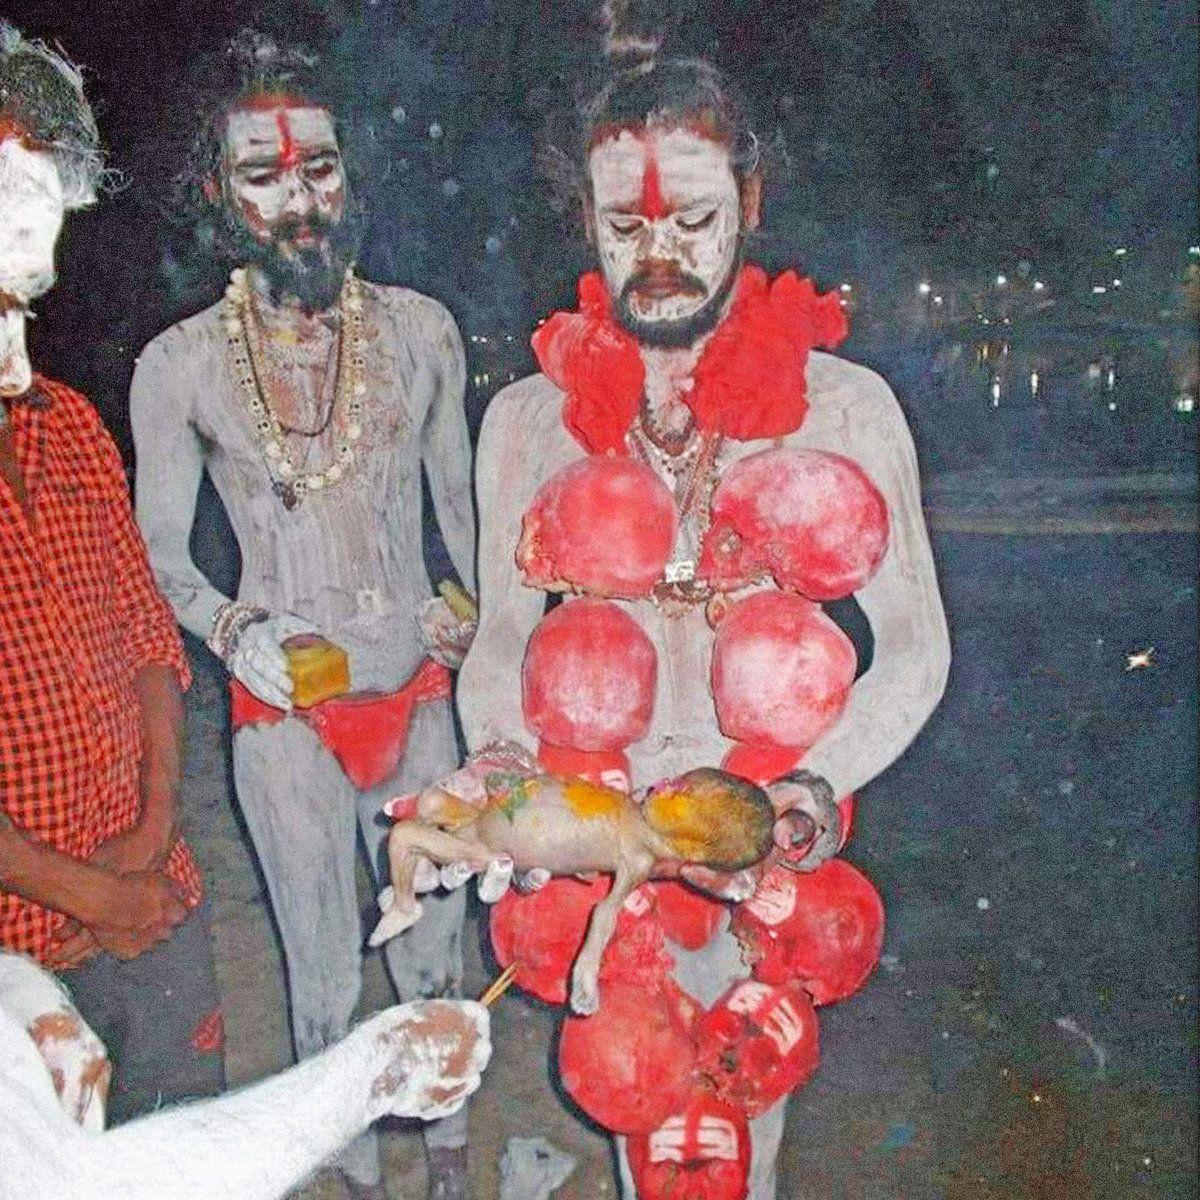 Review for Nirriti - অসূর্যস্পর্শা (Asuryasparsha)